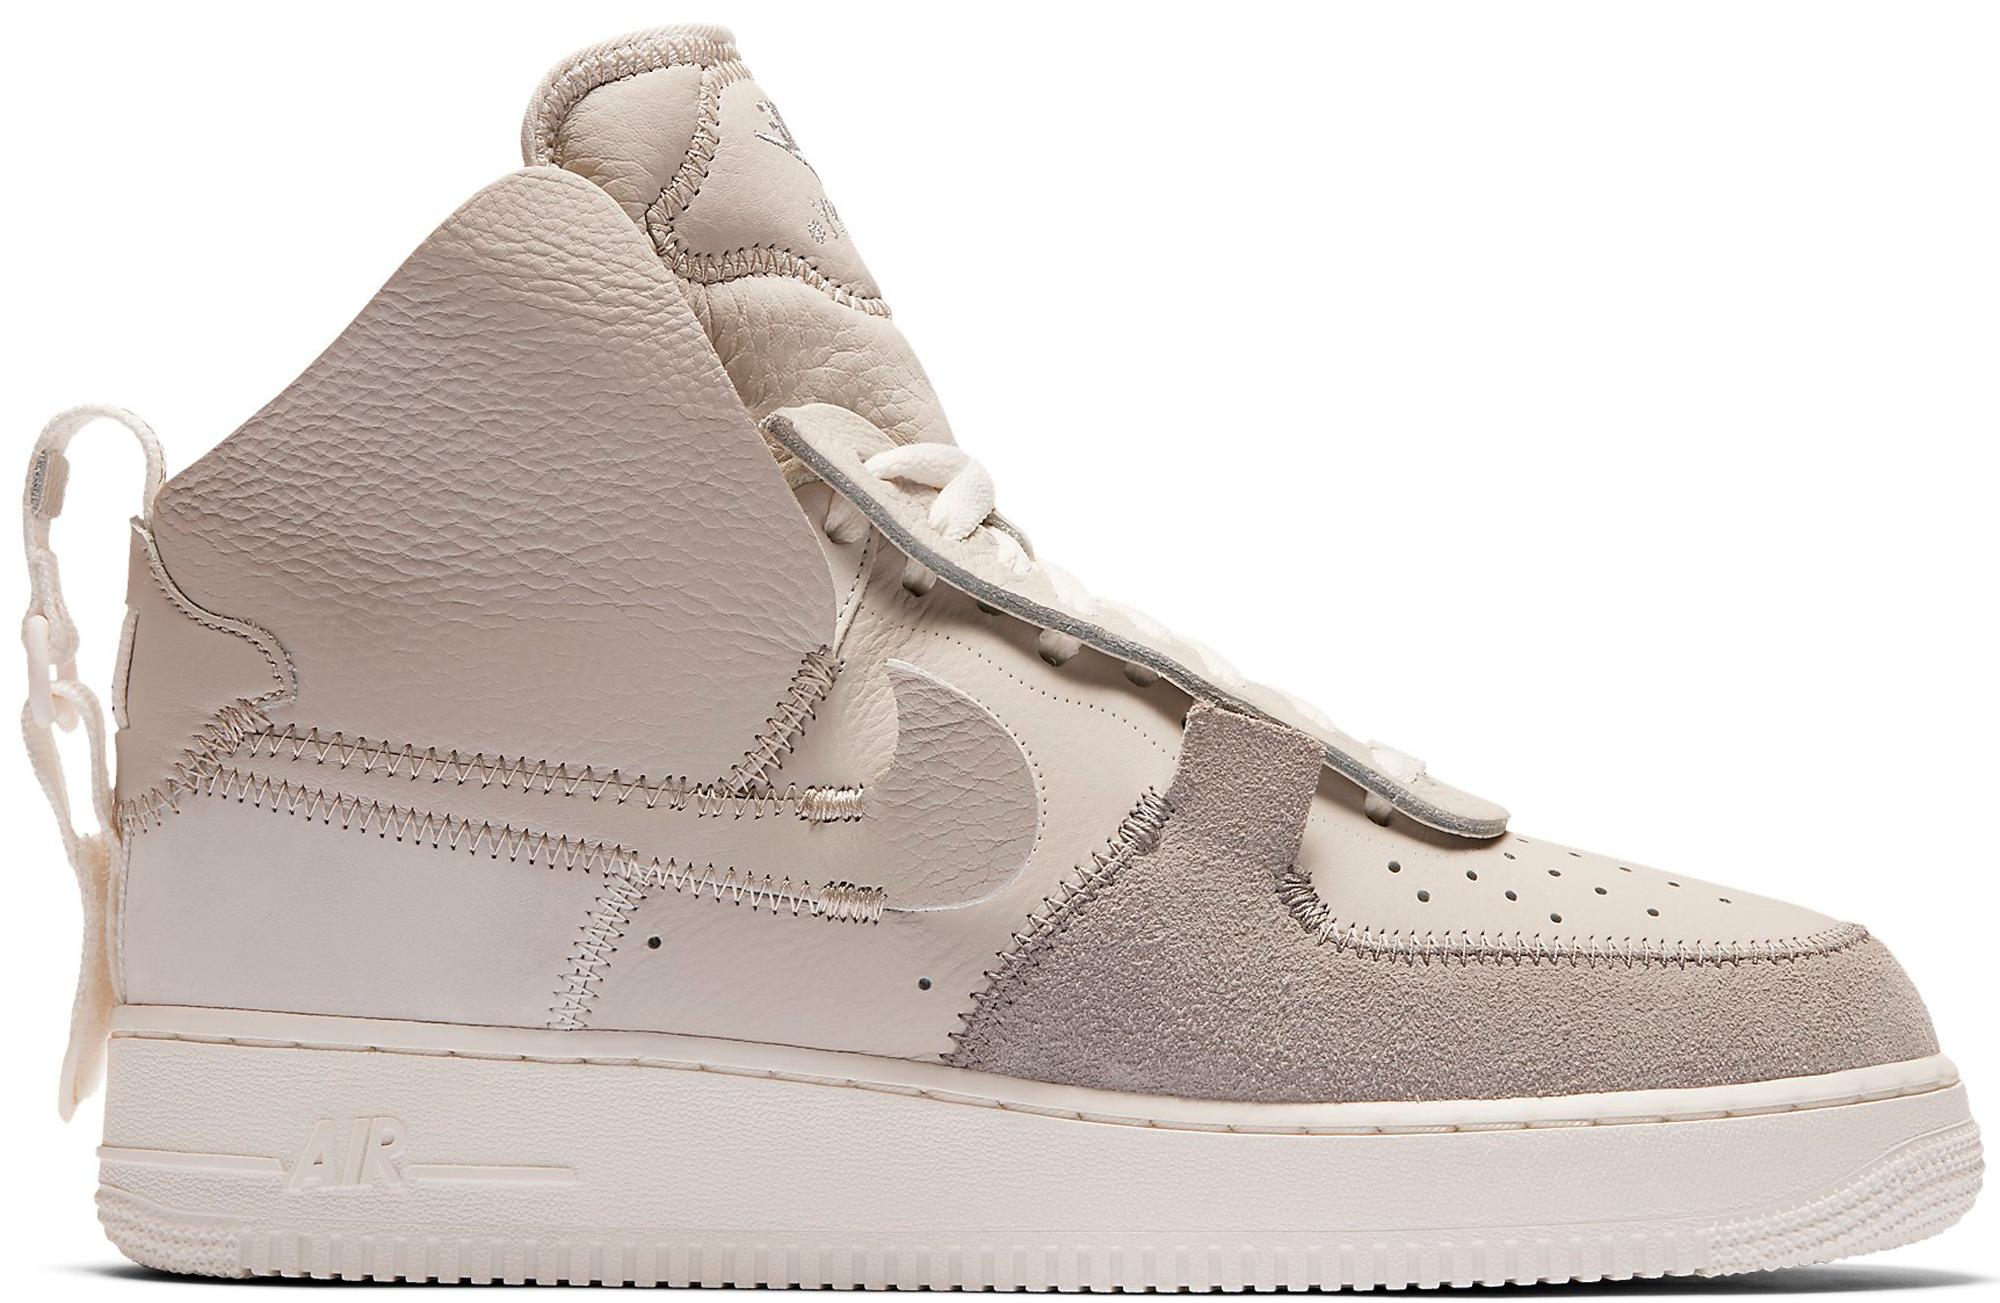 PSNY Nike Air Force 1 High Grey